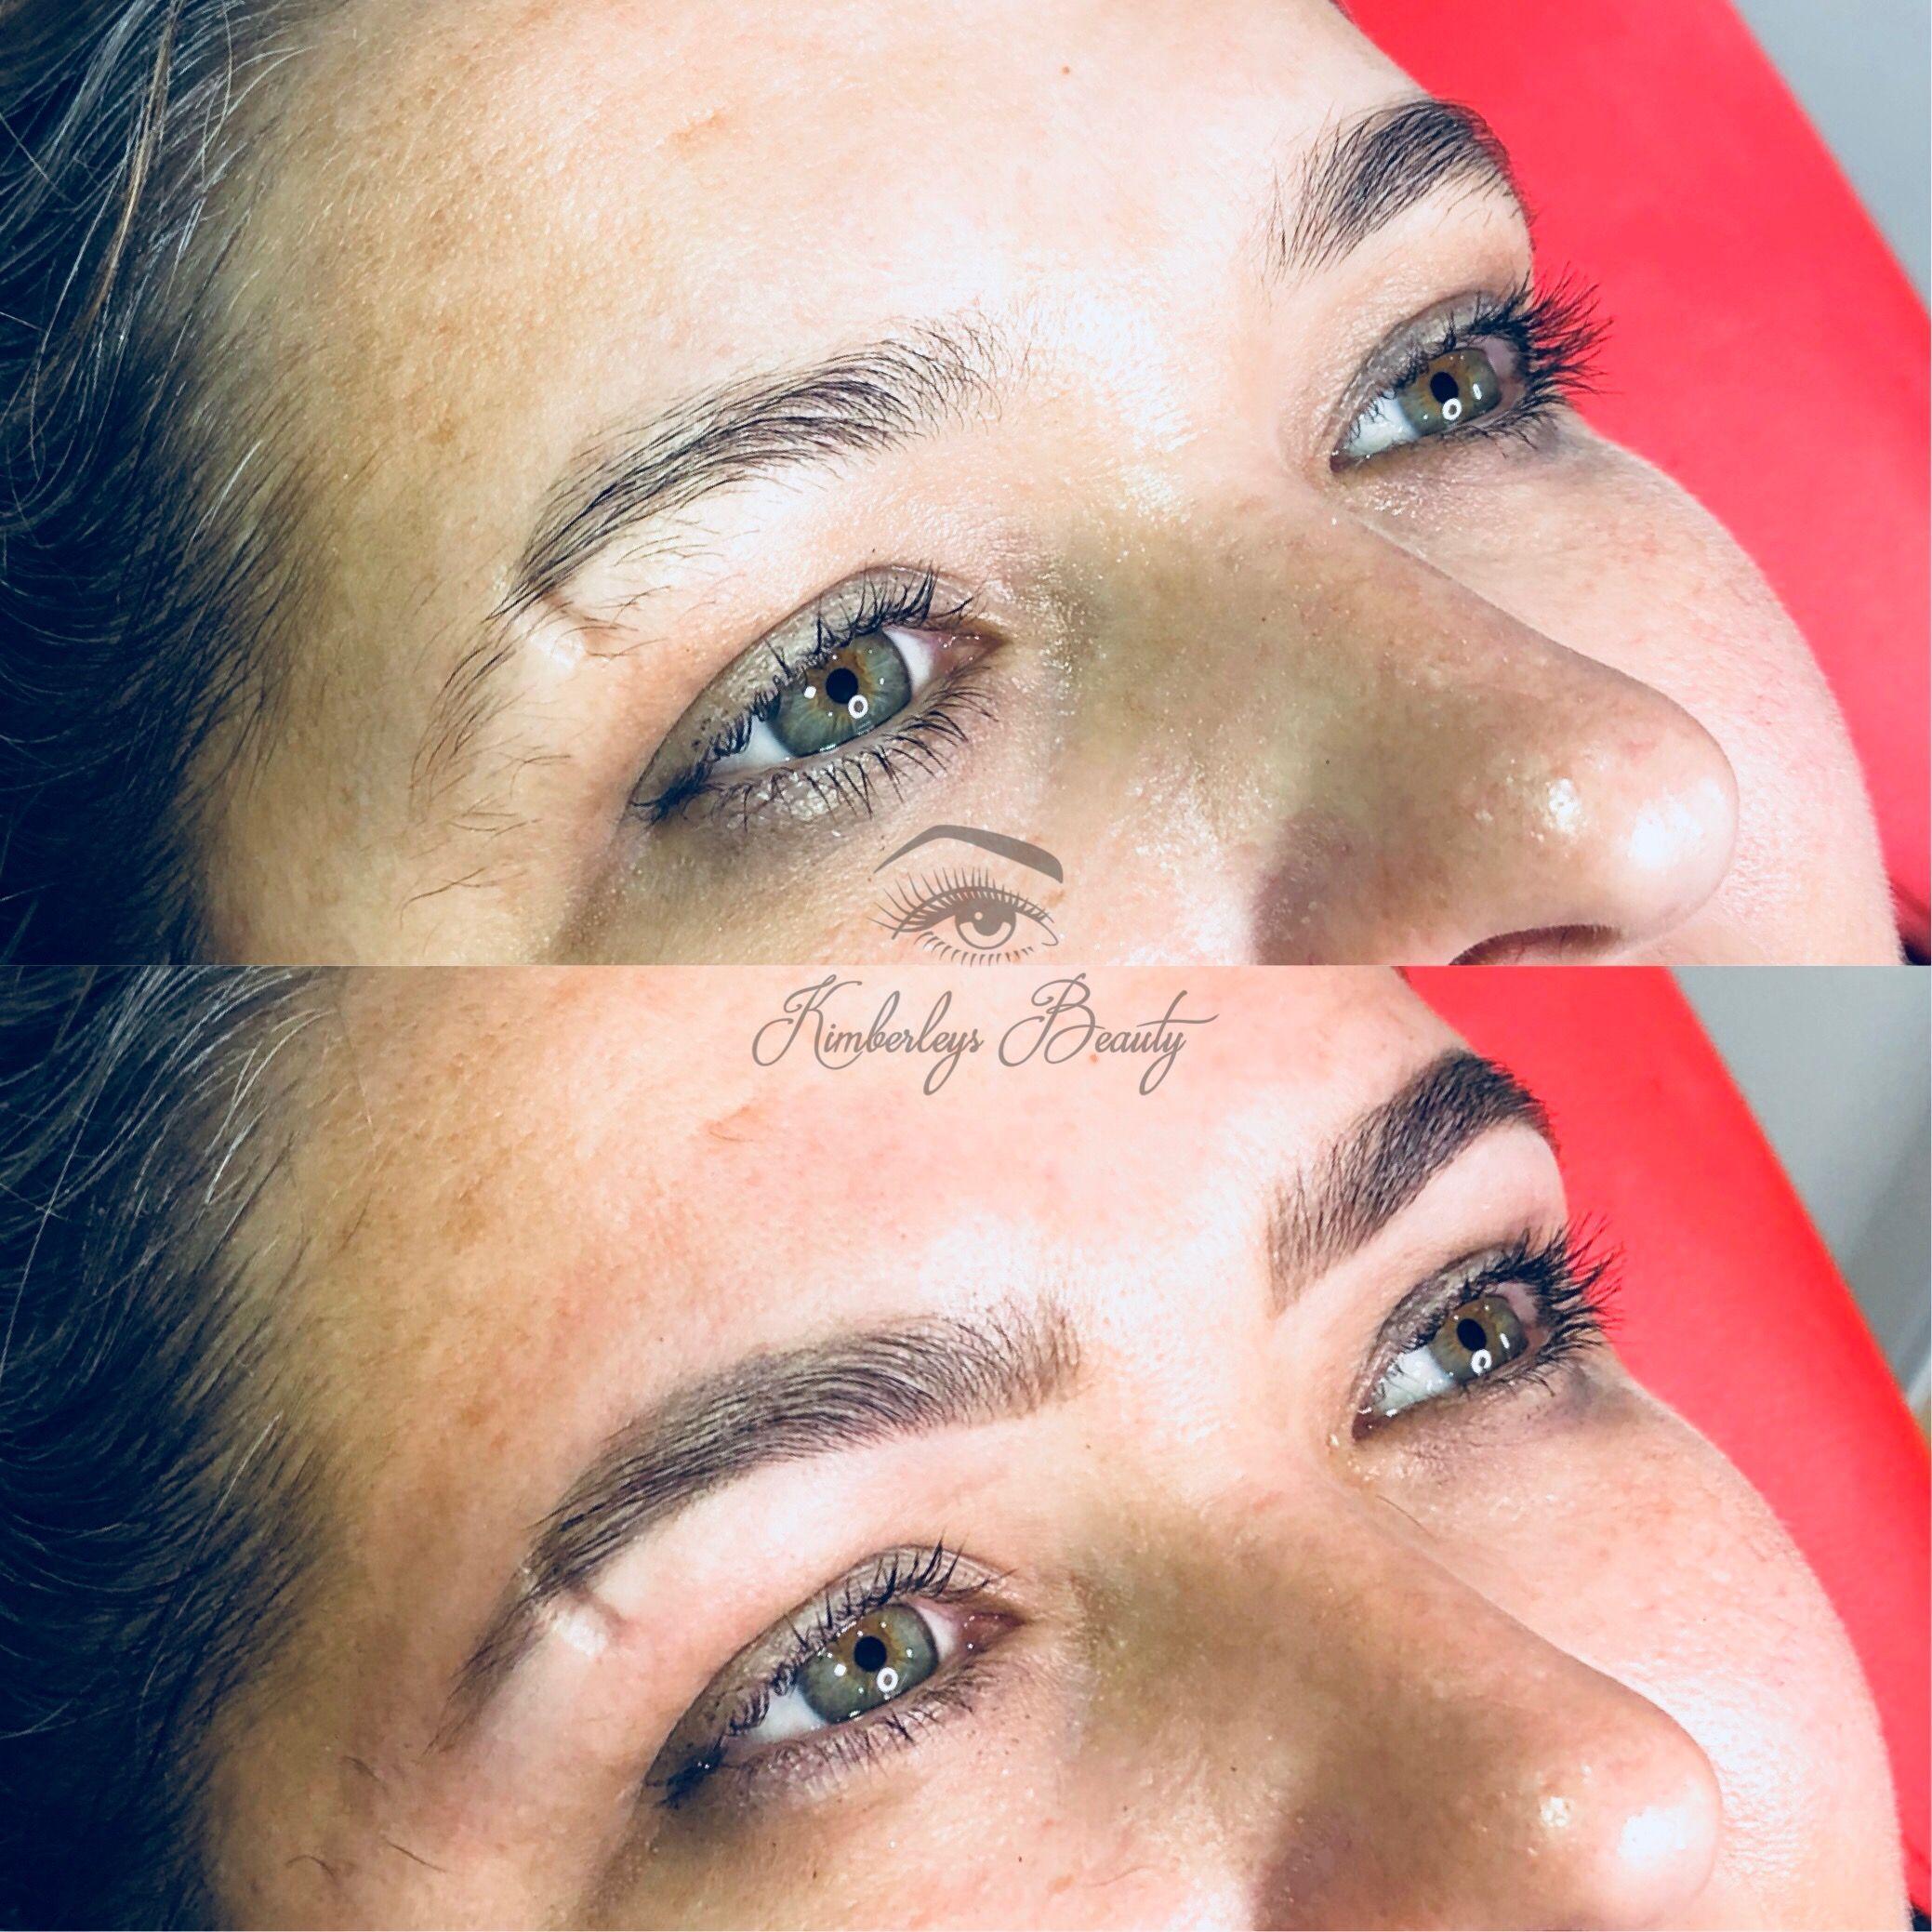 #Hdbrows #brows #makeup #beforeandafter #eyebrows #bristol #arch #browenvy #instagram #facebook #hair #nails #browbar #browroom #salon #howto #tutorial # ...